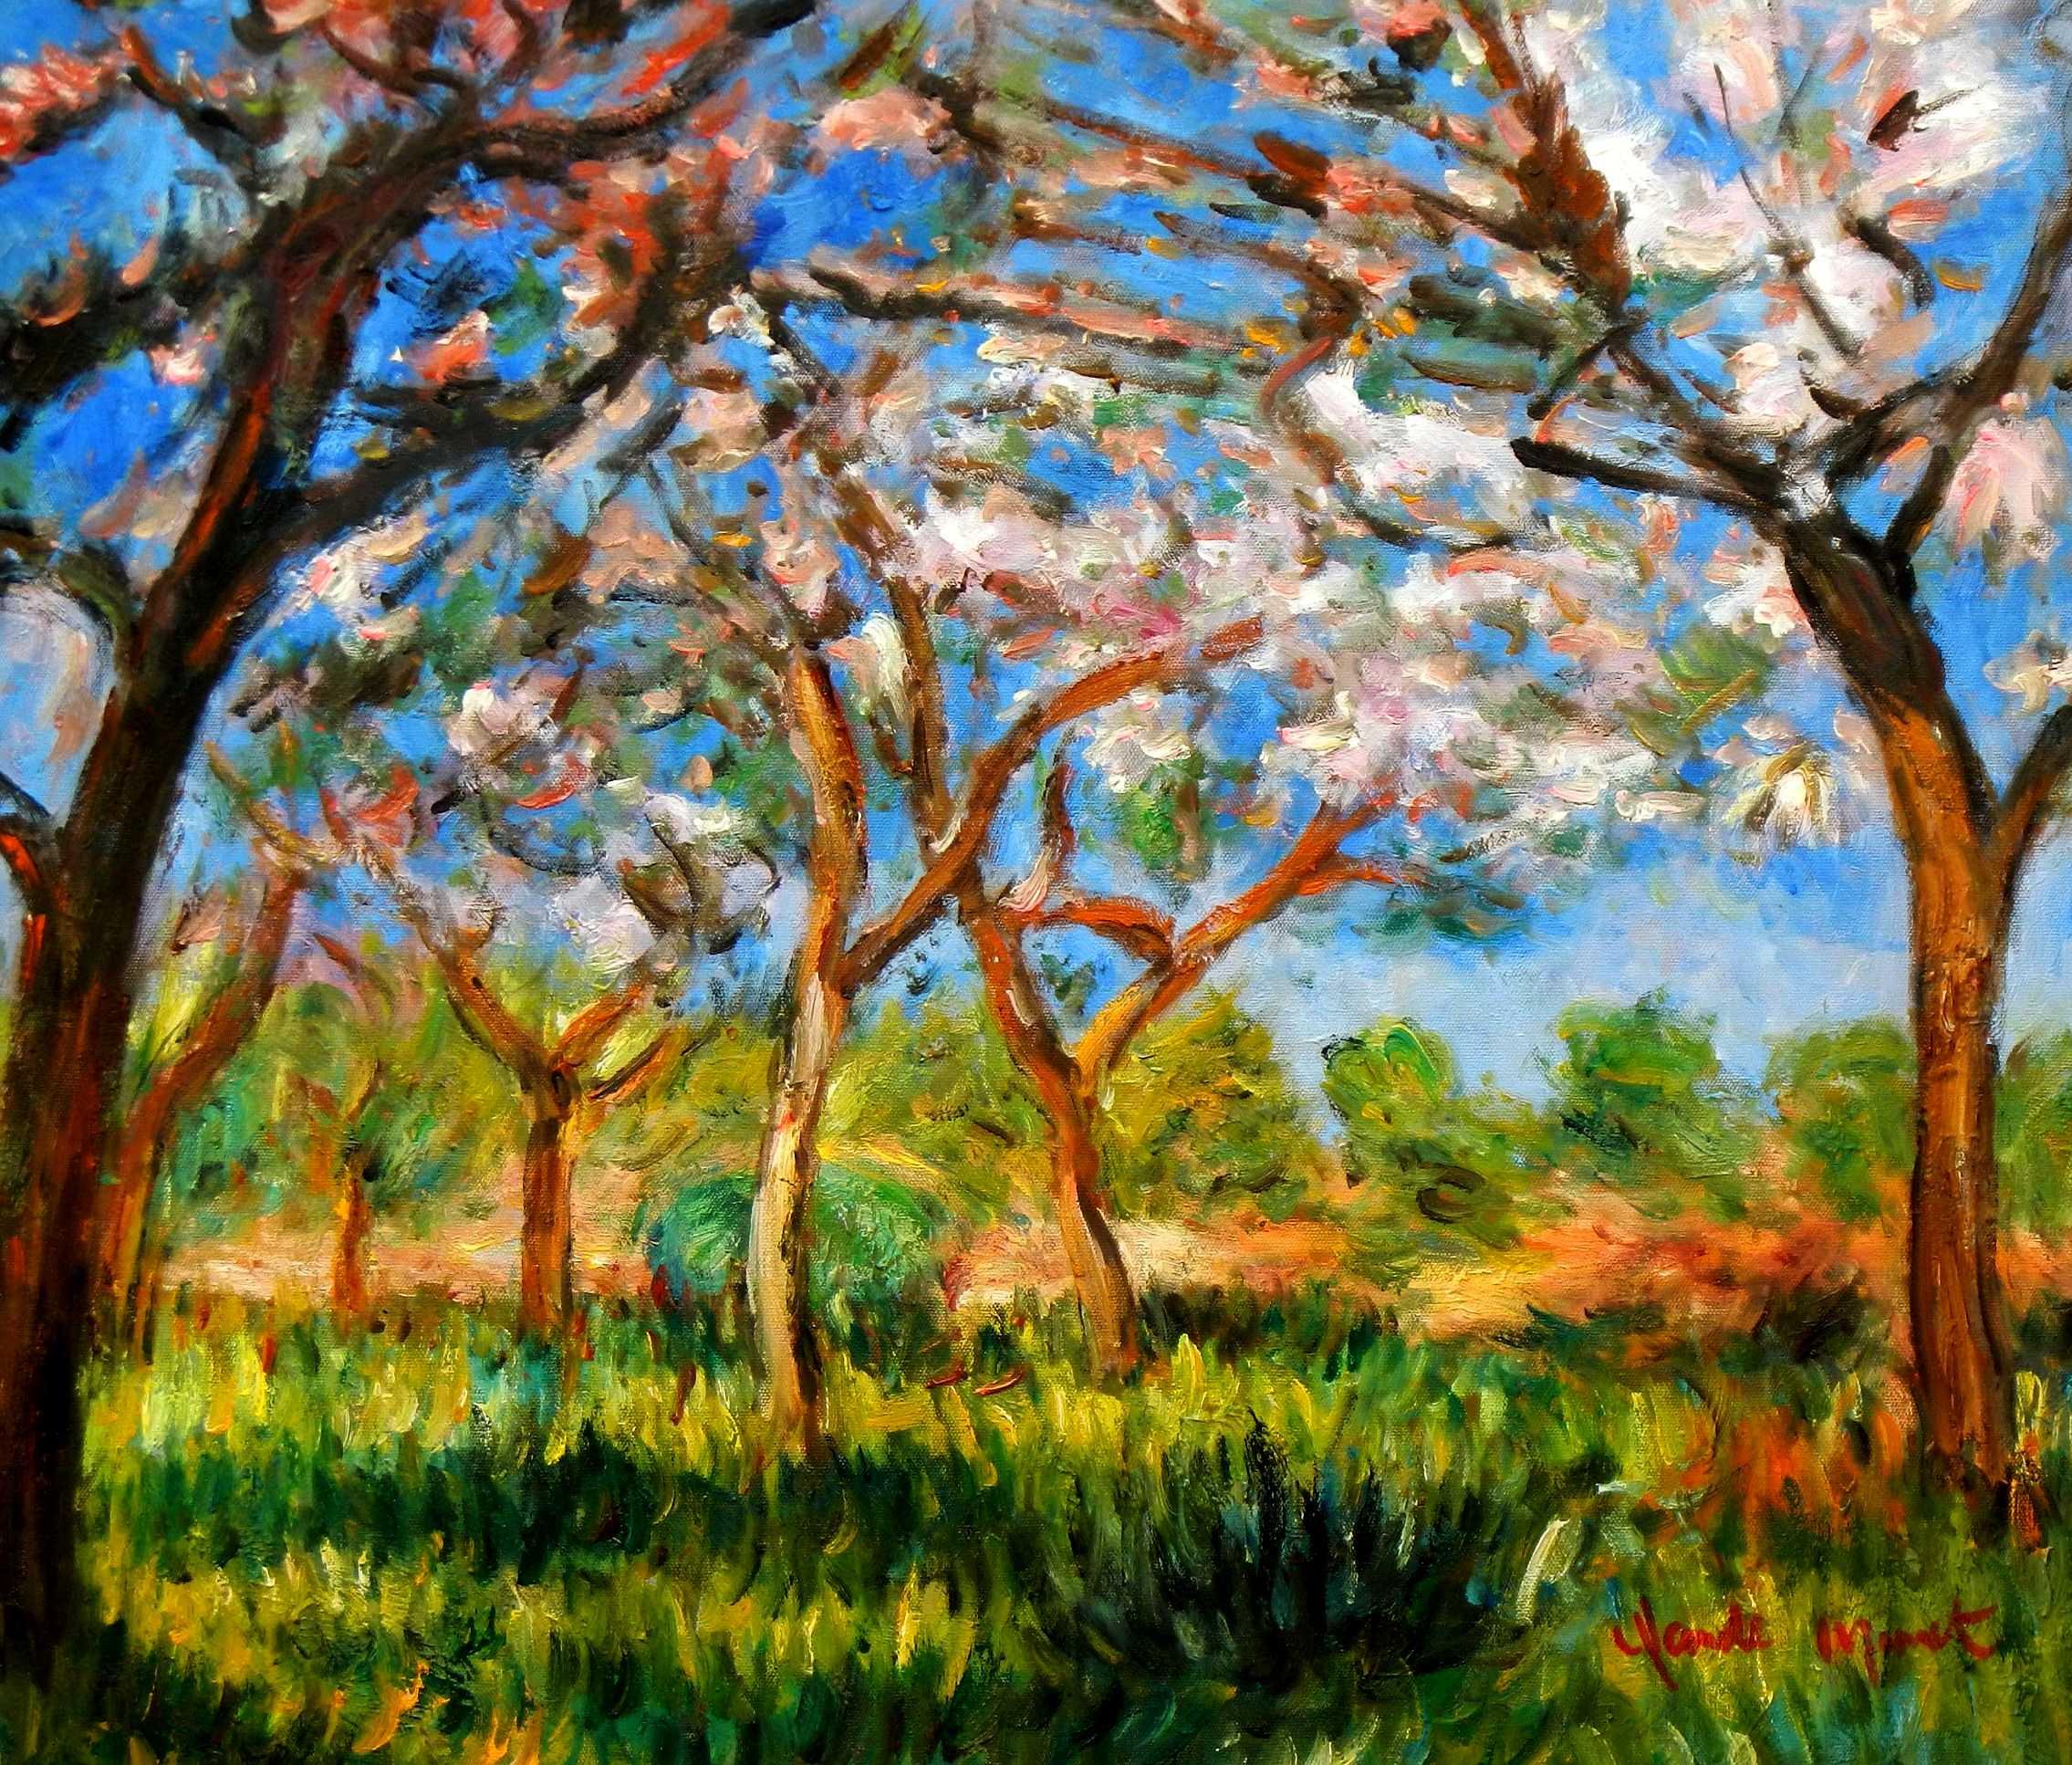 Claude Monet - Frühling in Giverny c94836 50x60cm exzellentes Ölgemälde